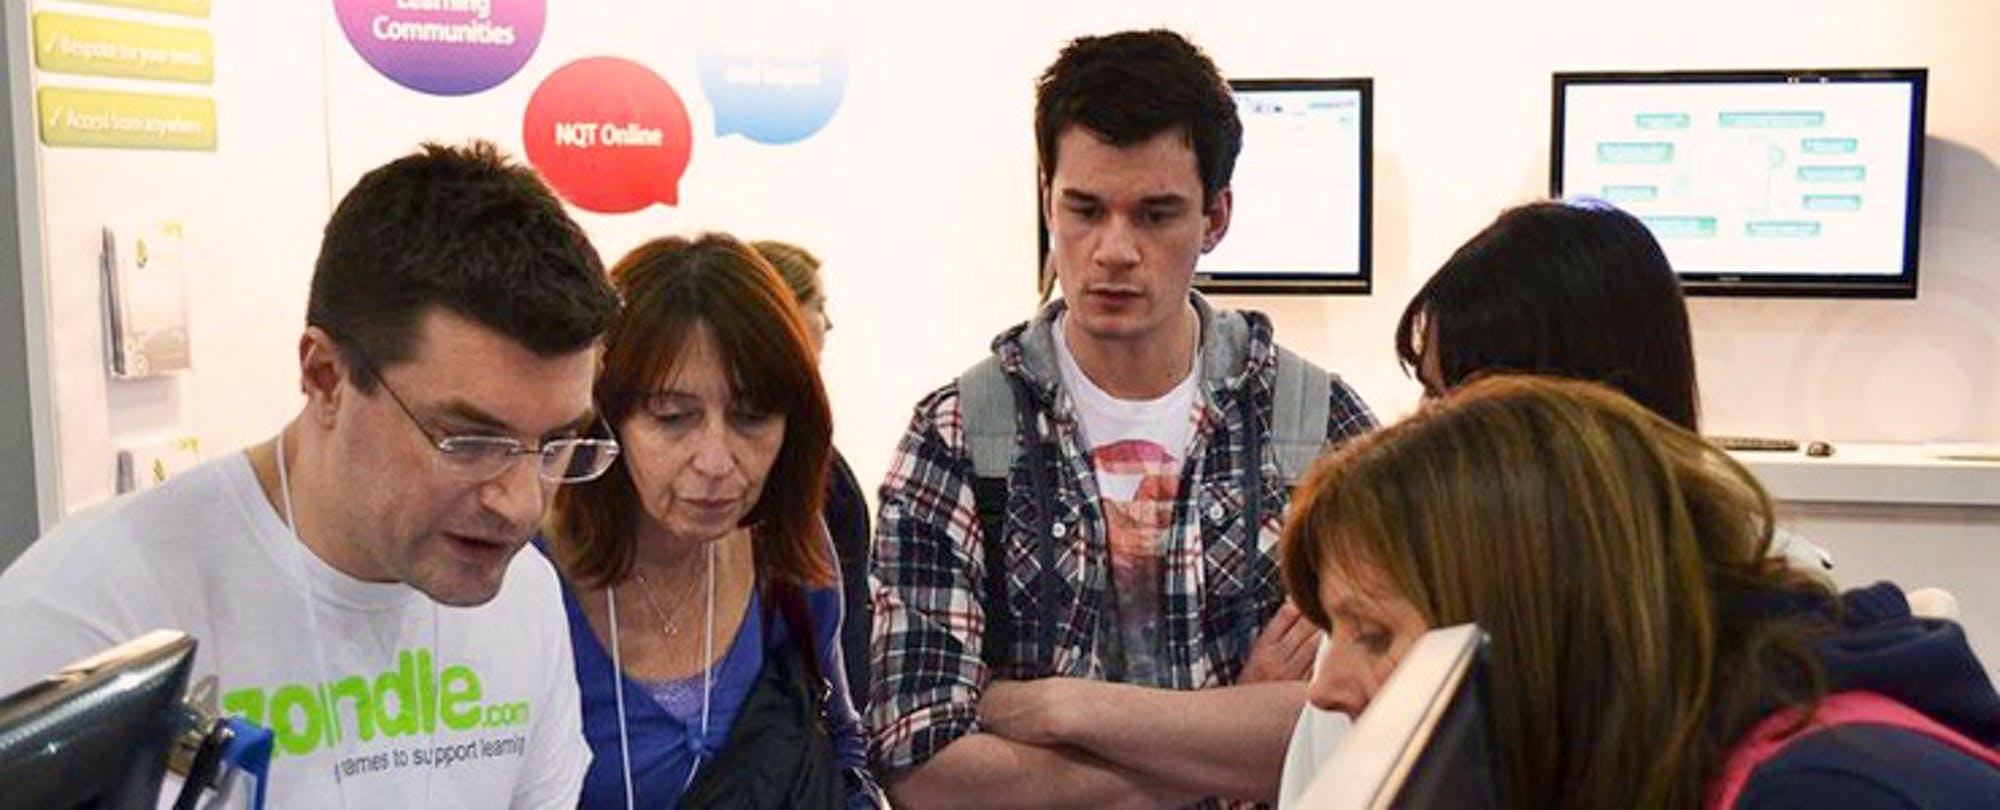 BETT Shows Off UK's Education Technology Finest